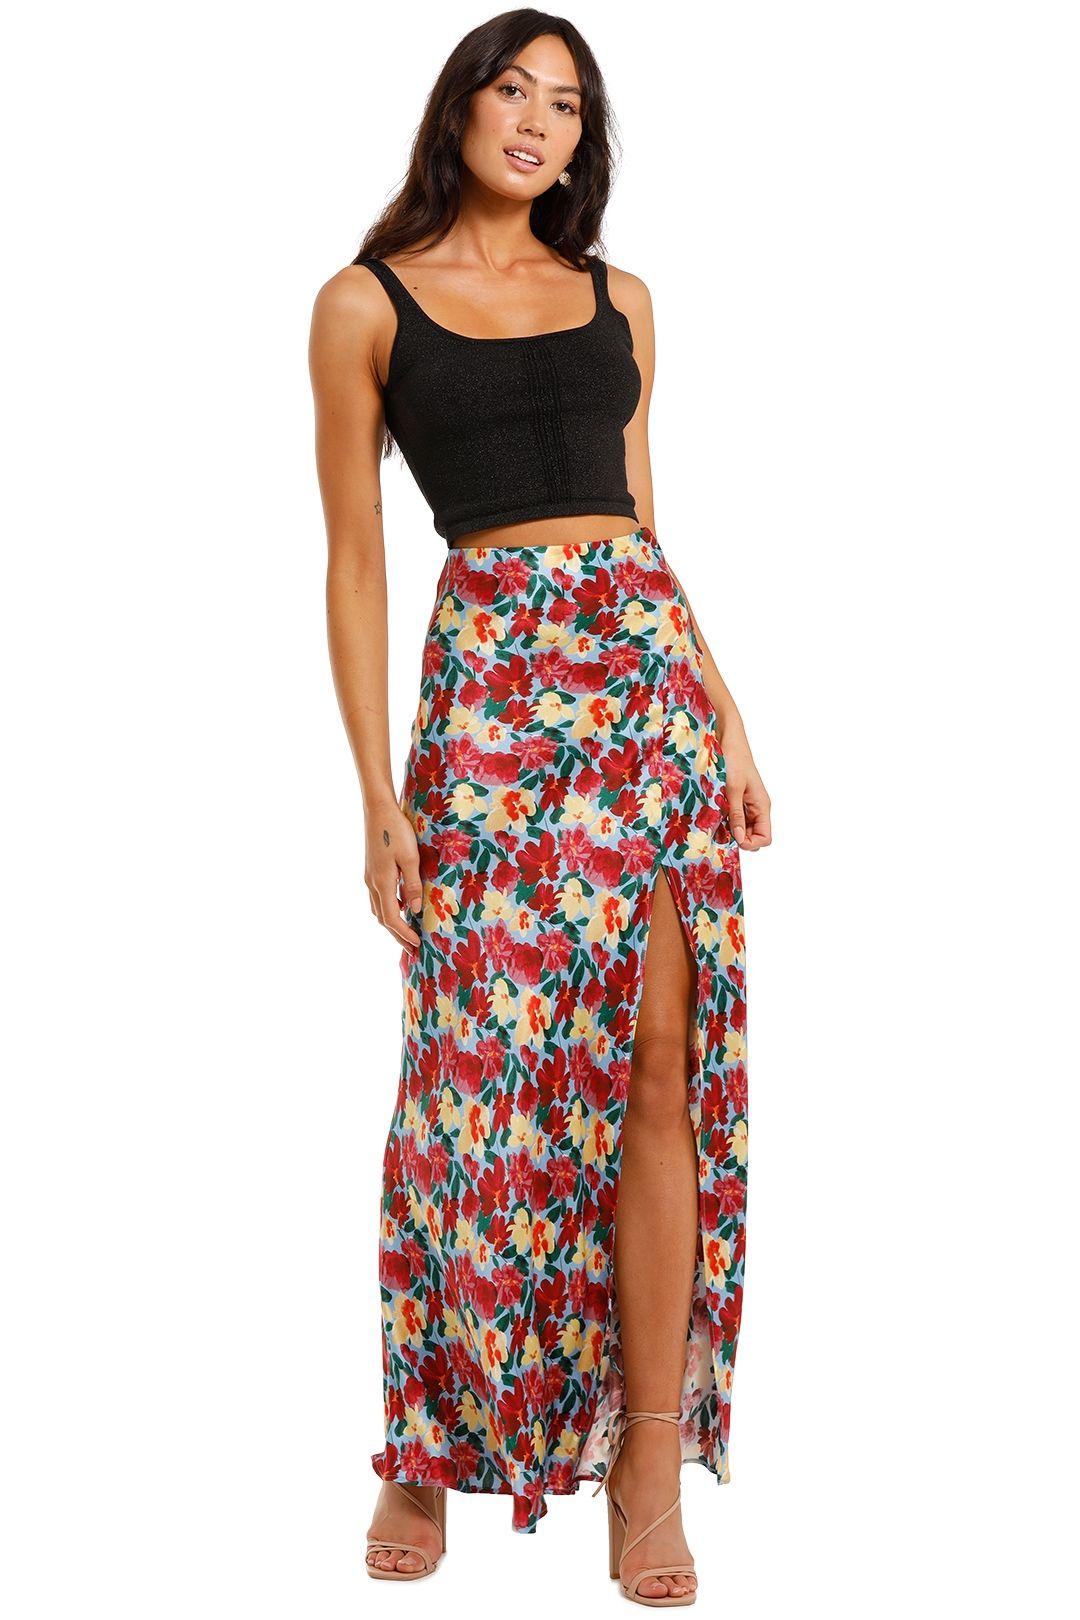 Bec and Bridge Lucette Midi Skirt Floral print